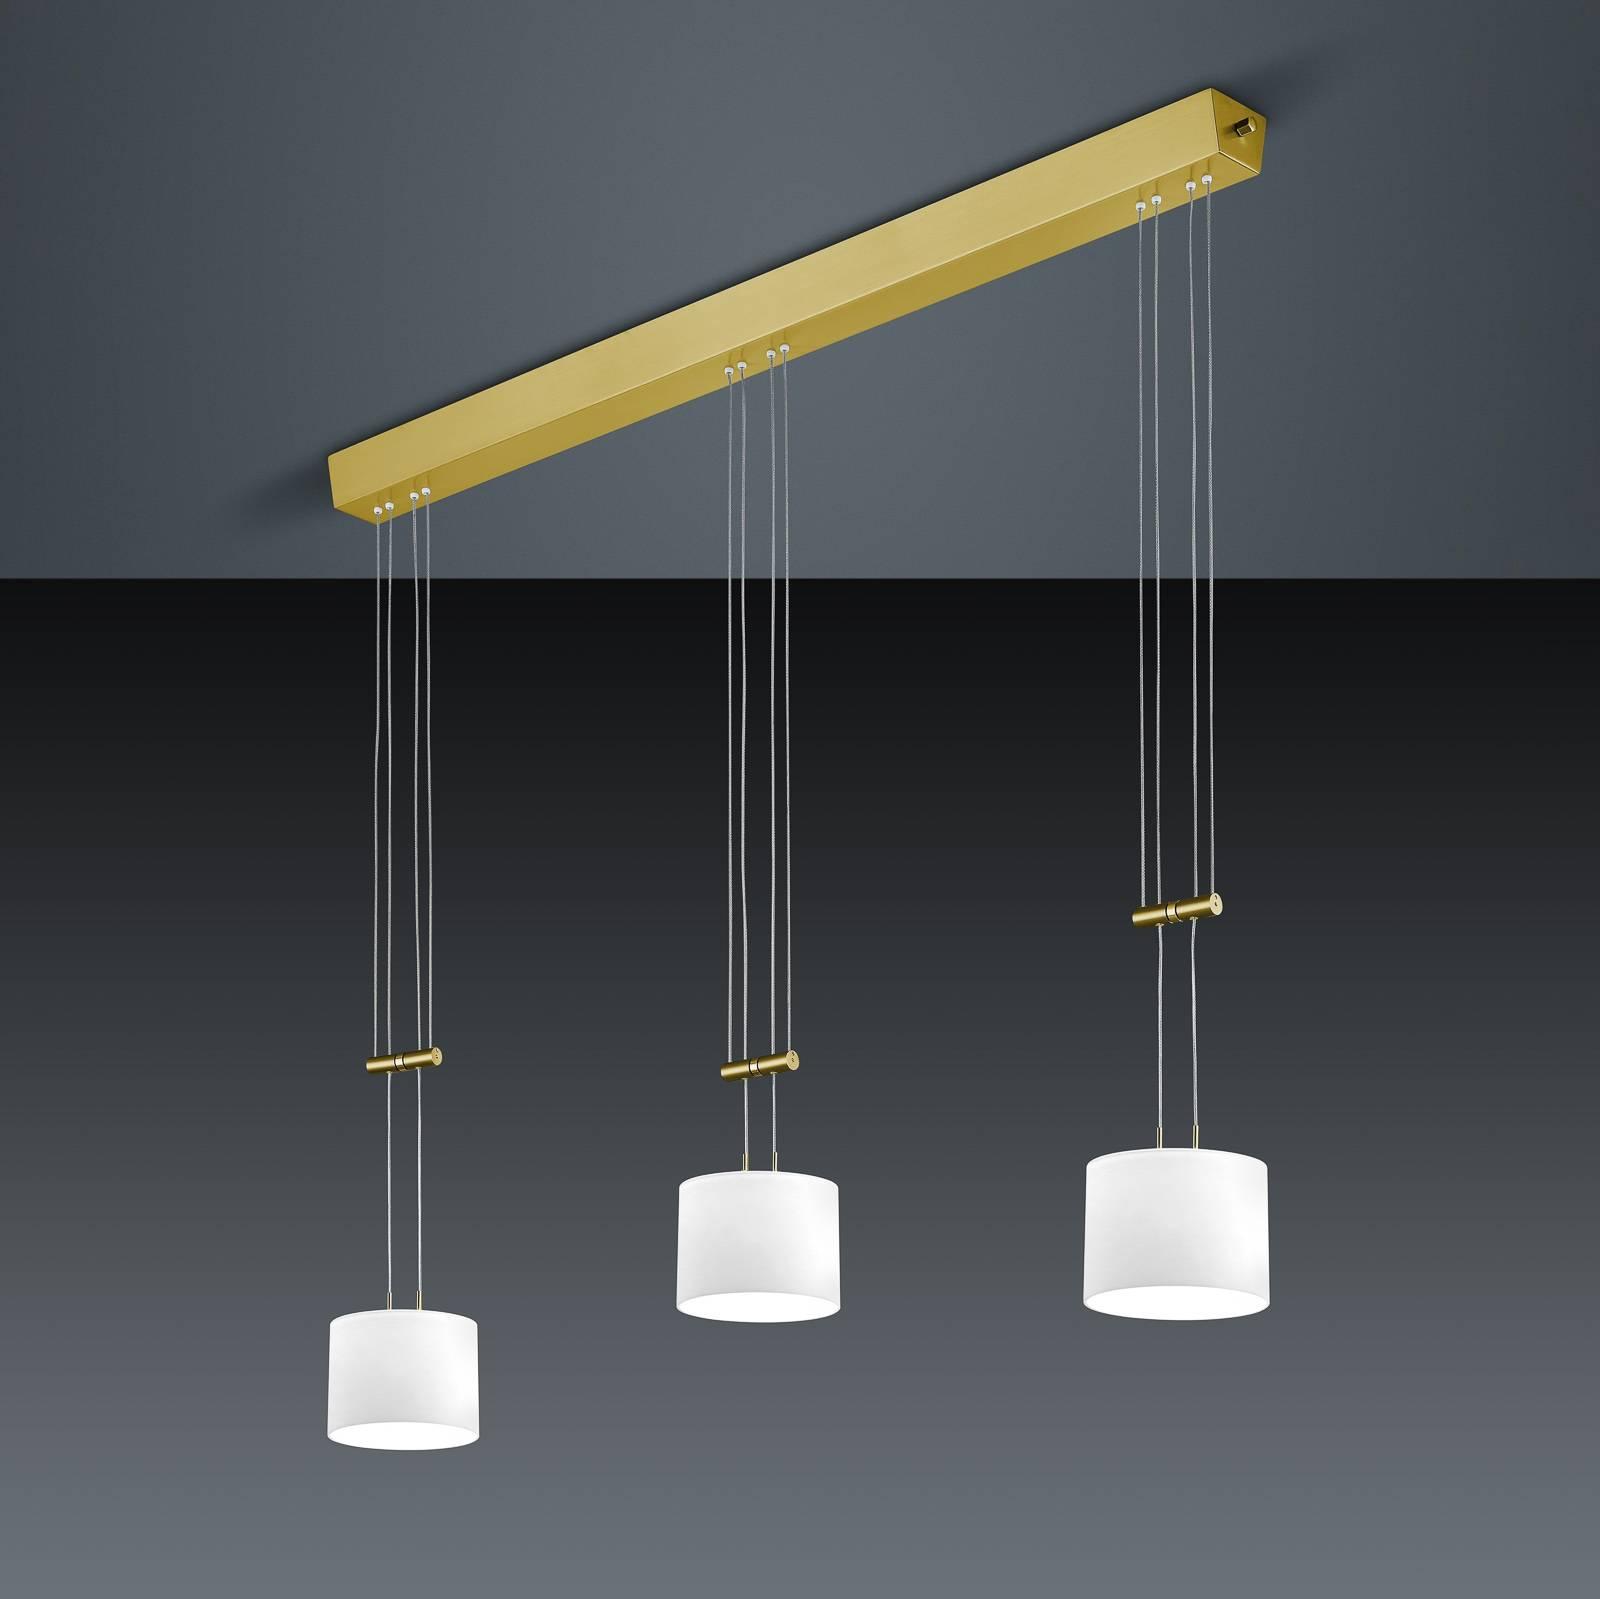 BANKAMP Grazia riippuvalo 3-lamp pitkä messinki